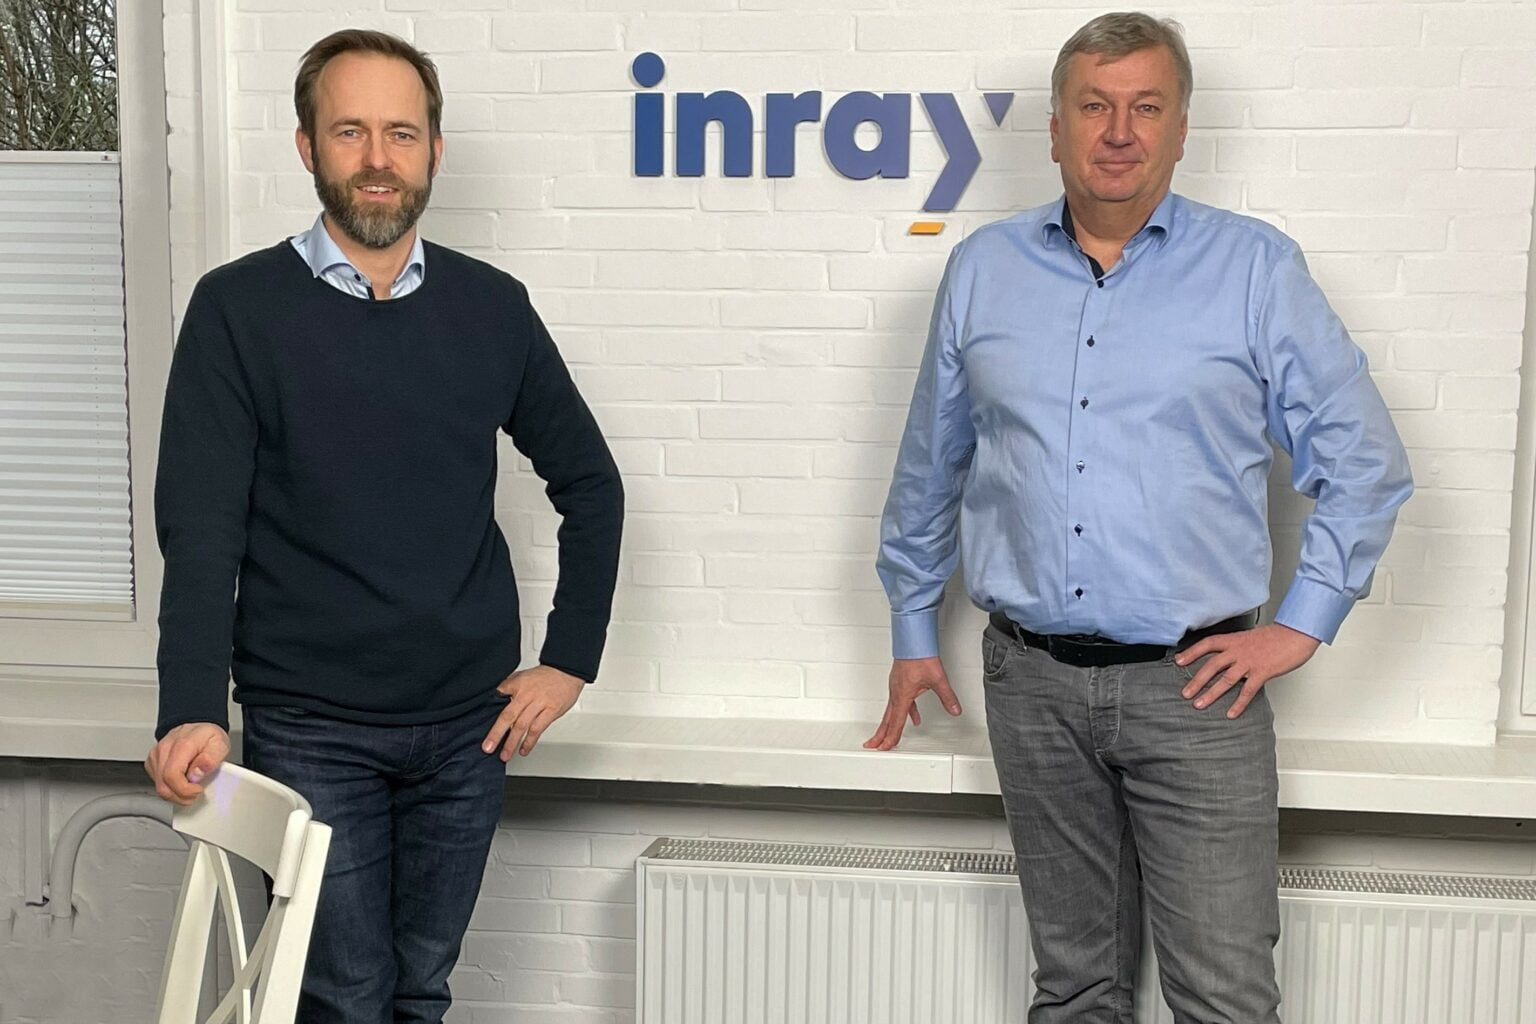 inray Top Arbeitgeber Mittelstand 2021_Manfred Radtke, Sören Rose